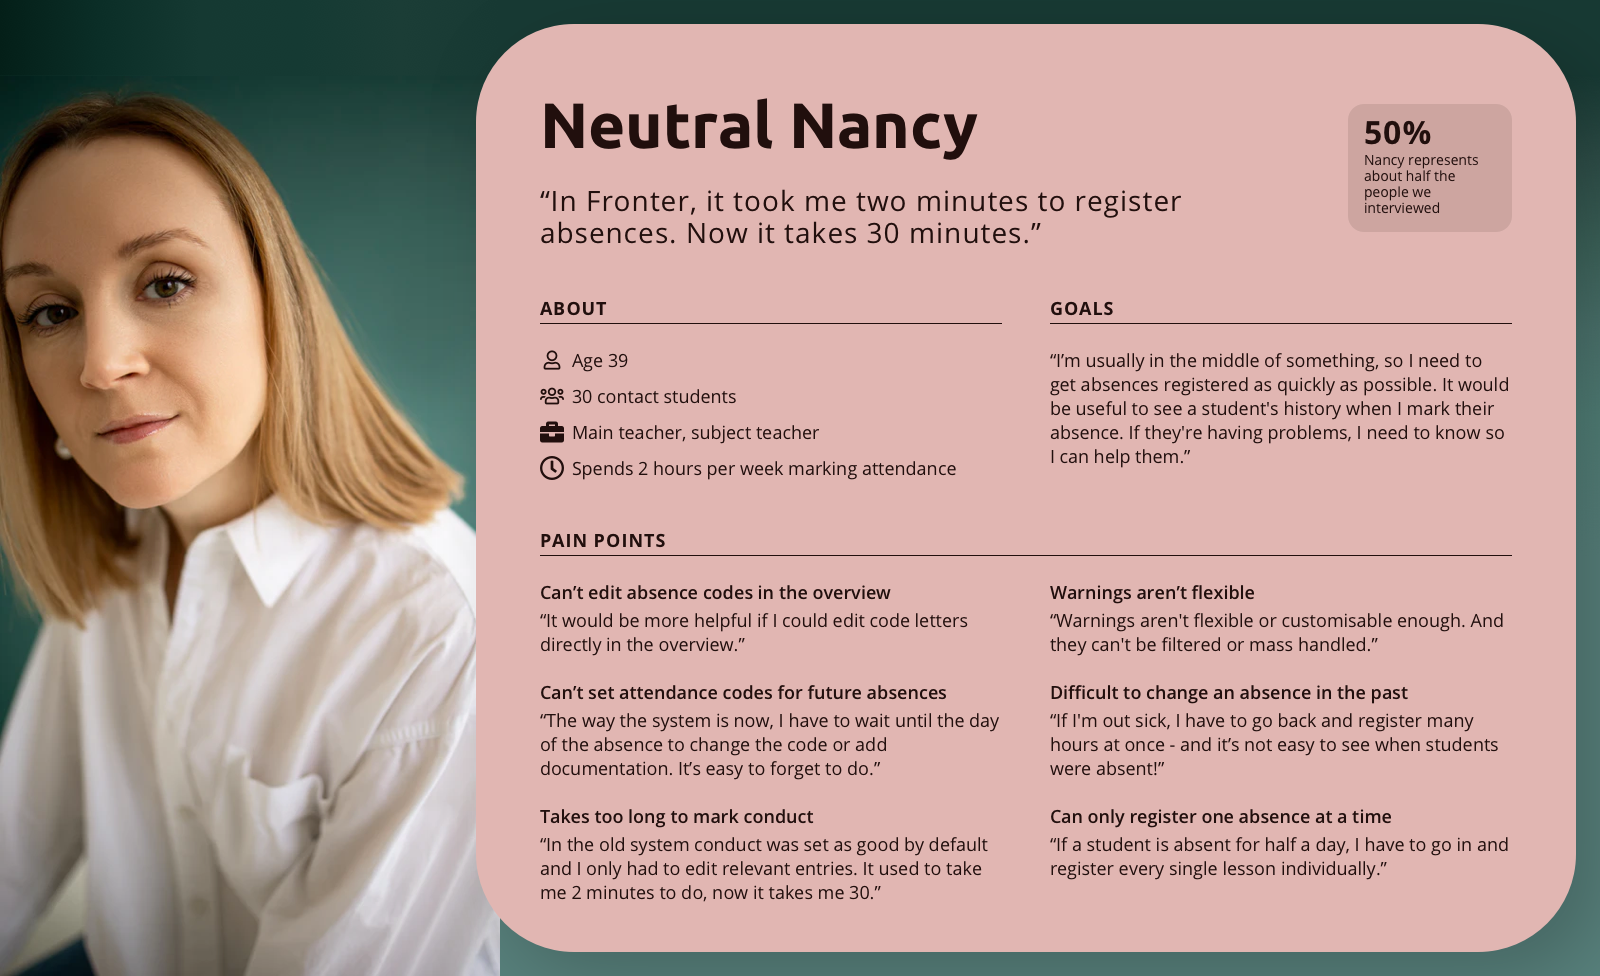 Description of a user persona named Neutral Nancy